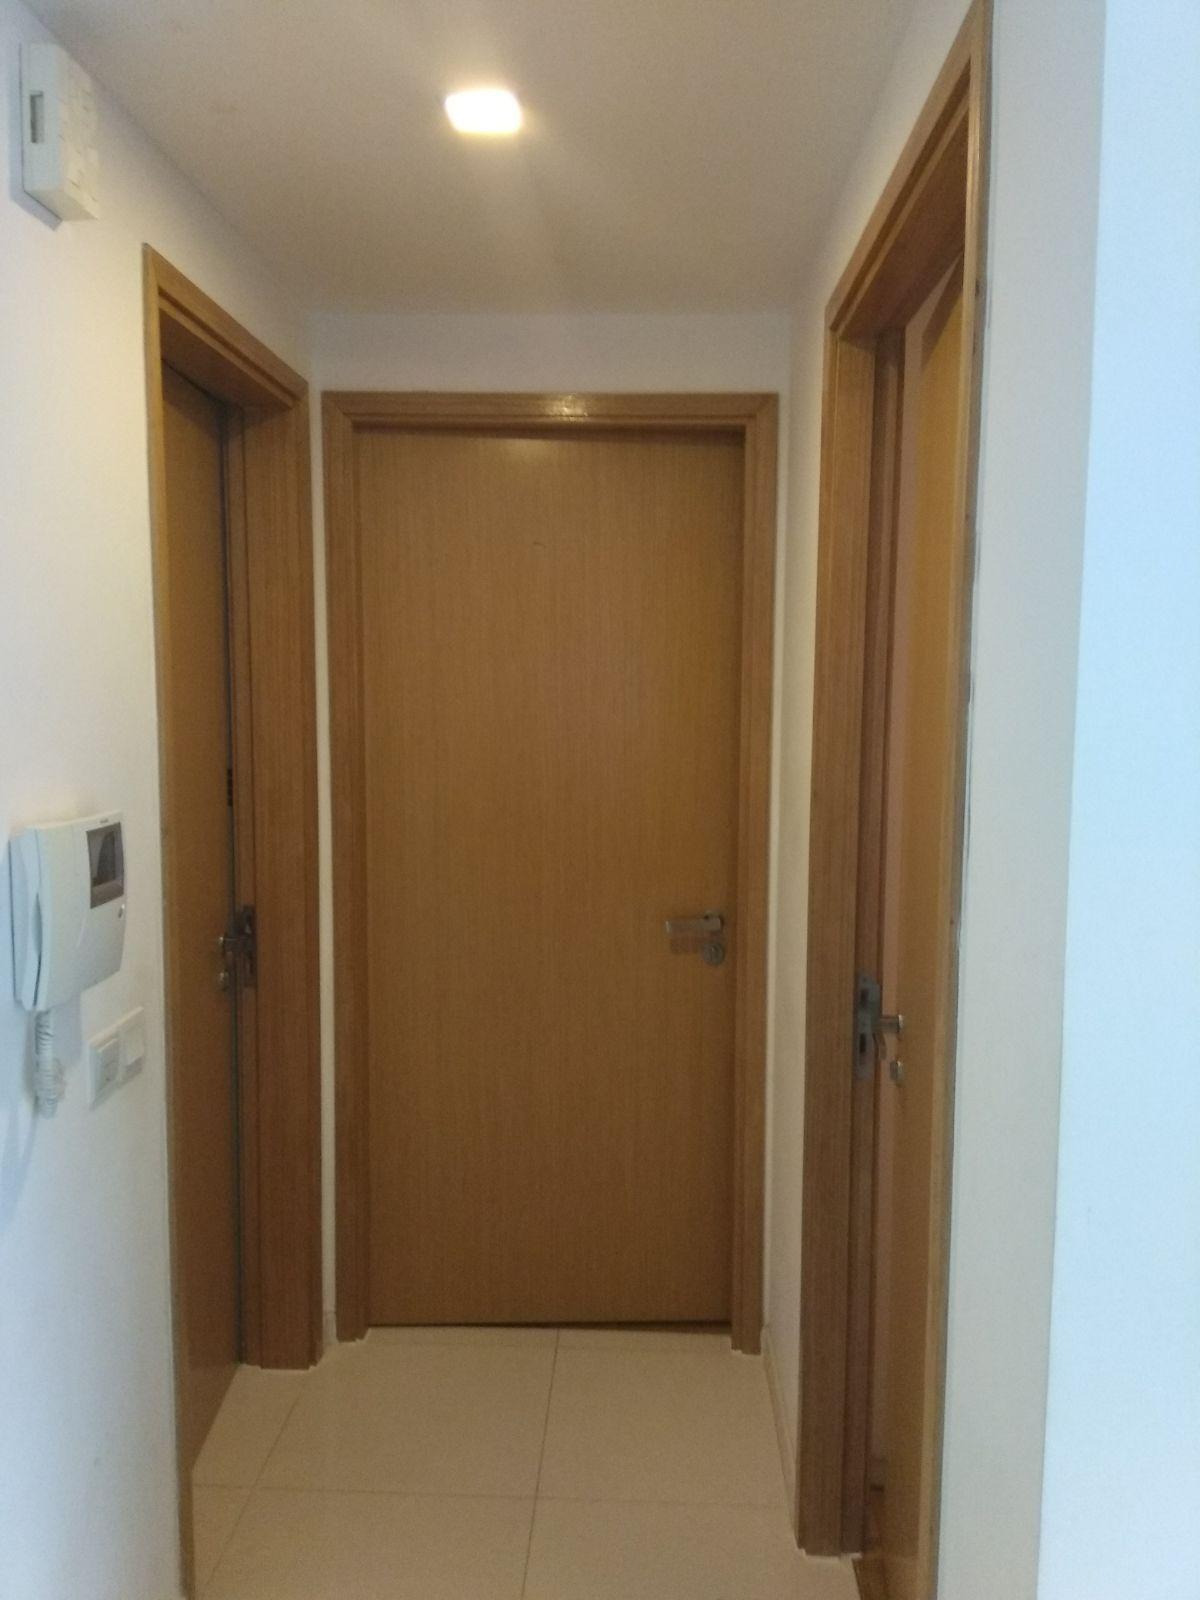 Wooden Door Frame Repair And Installation Instant Quote